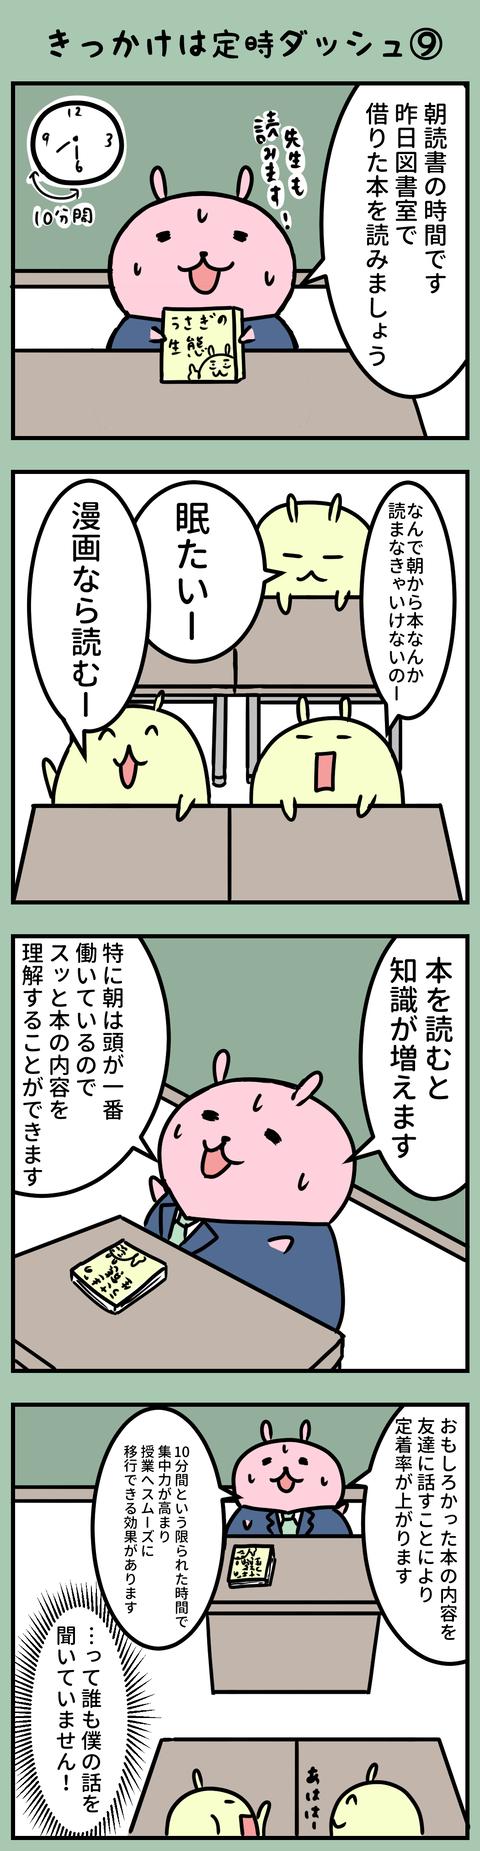 manga-yuzuporo57-1